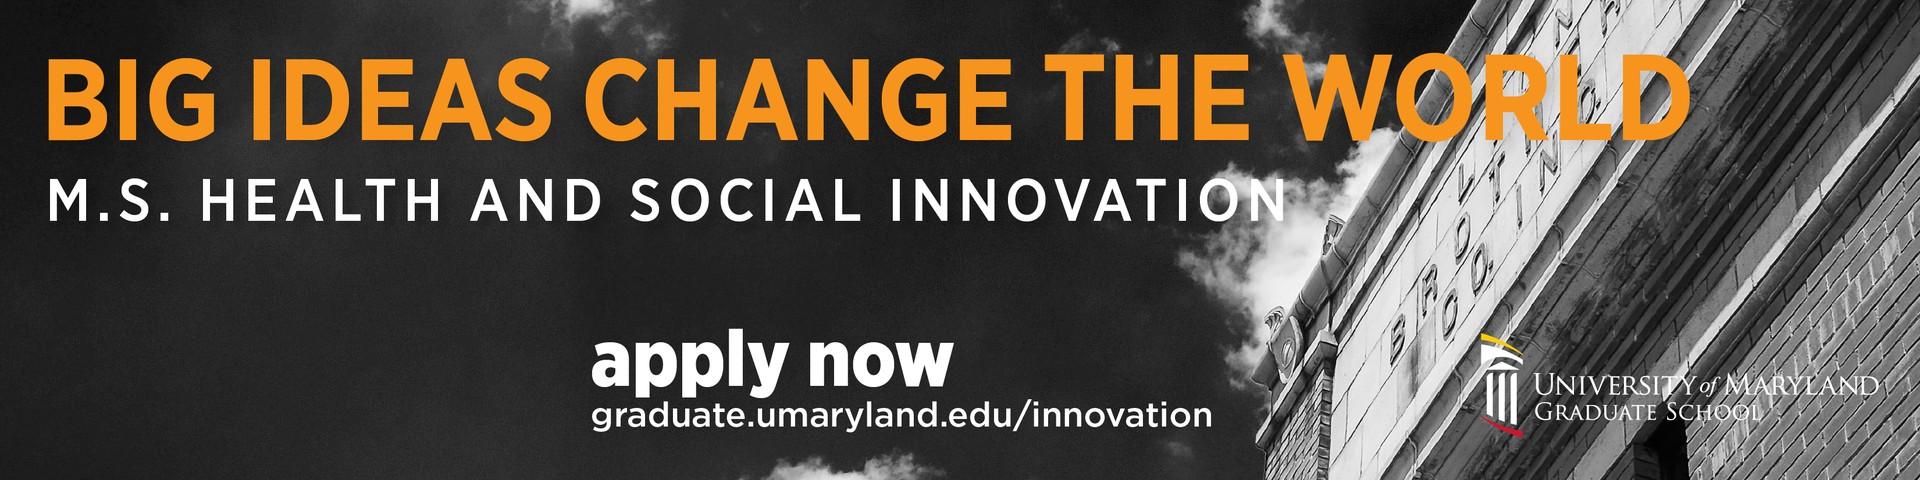 University of Maryland, Baltimore Graduate School   LinkedIn